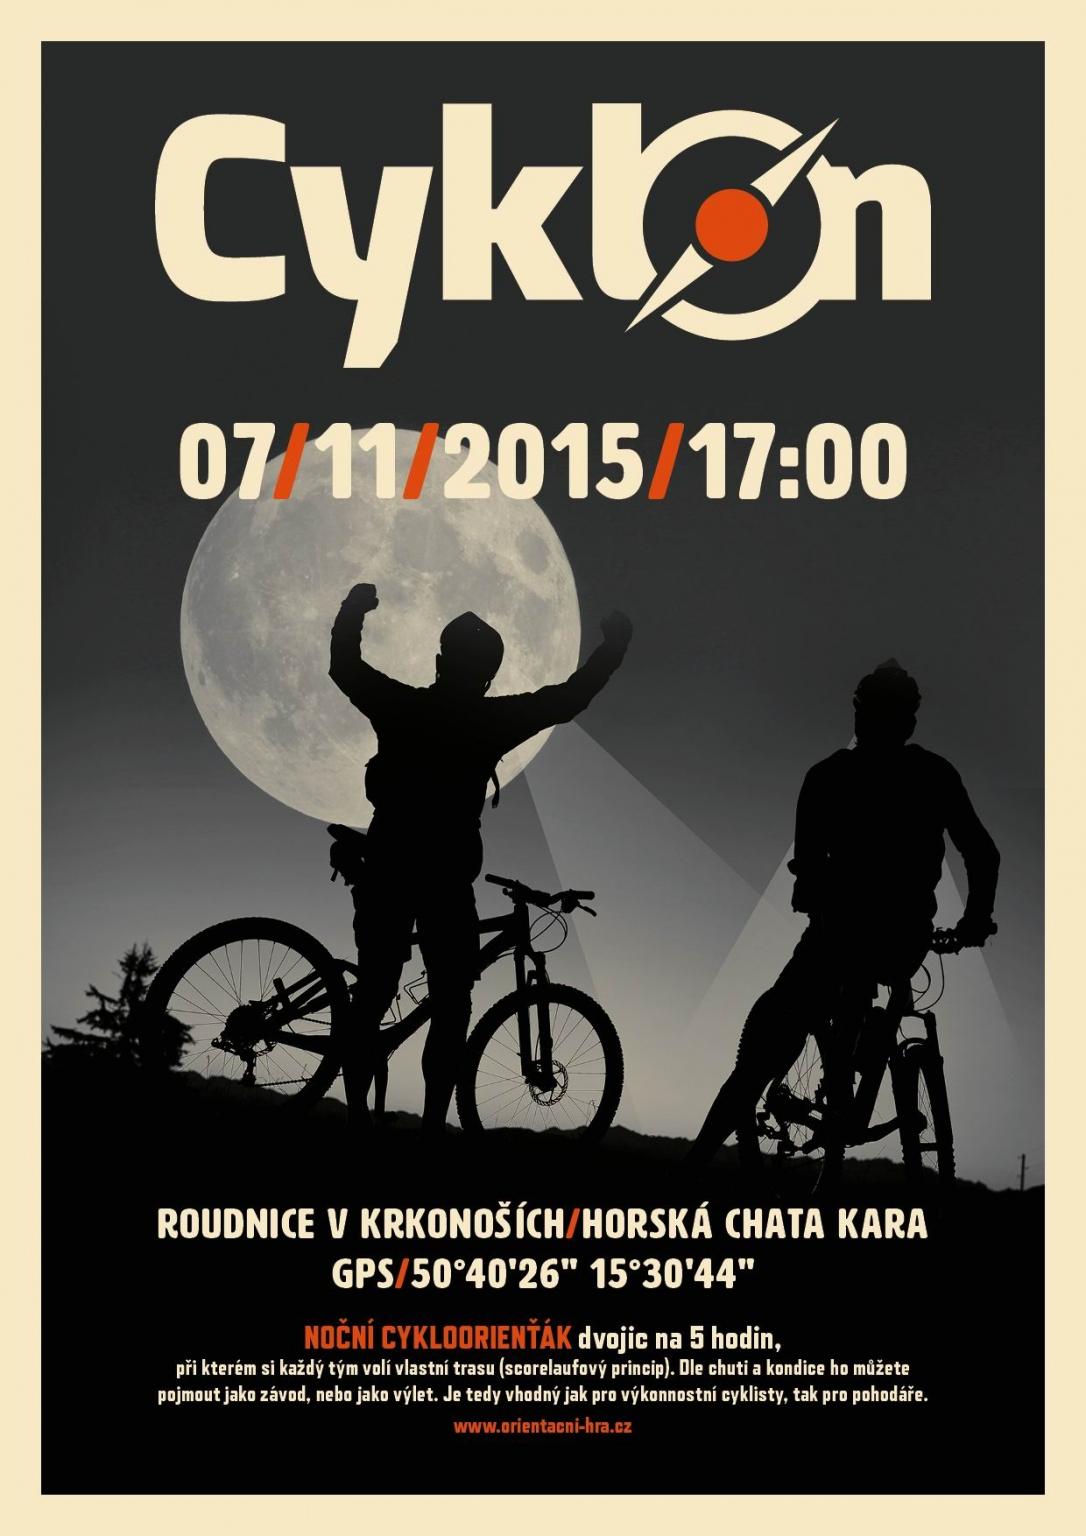 Cyklon 2015 p1